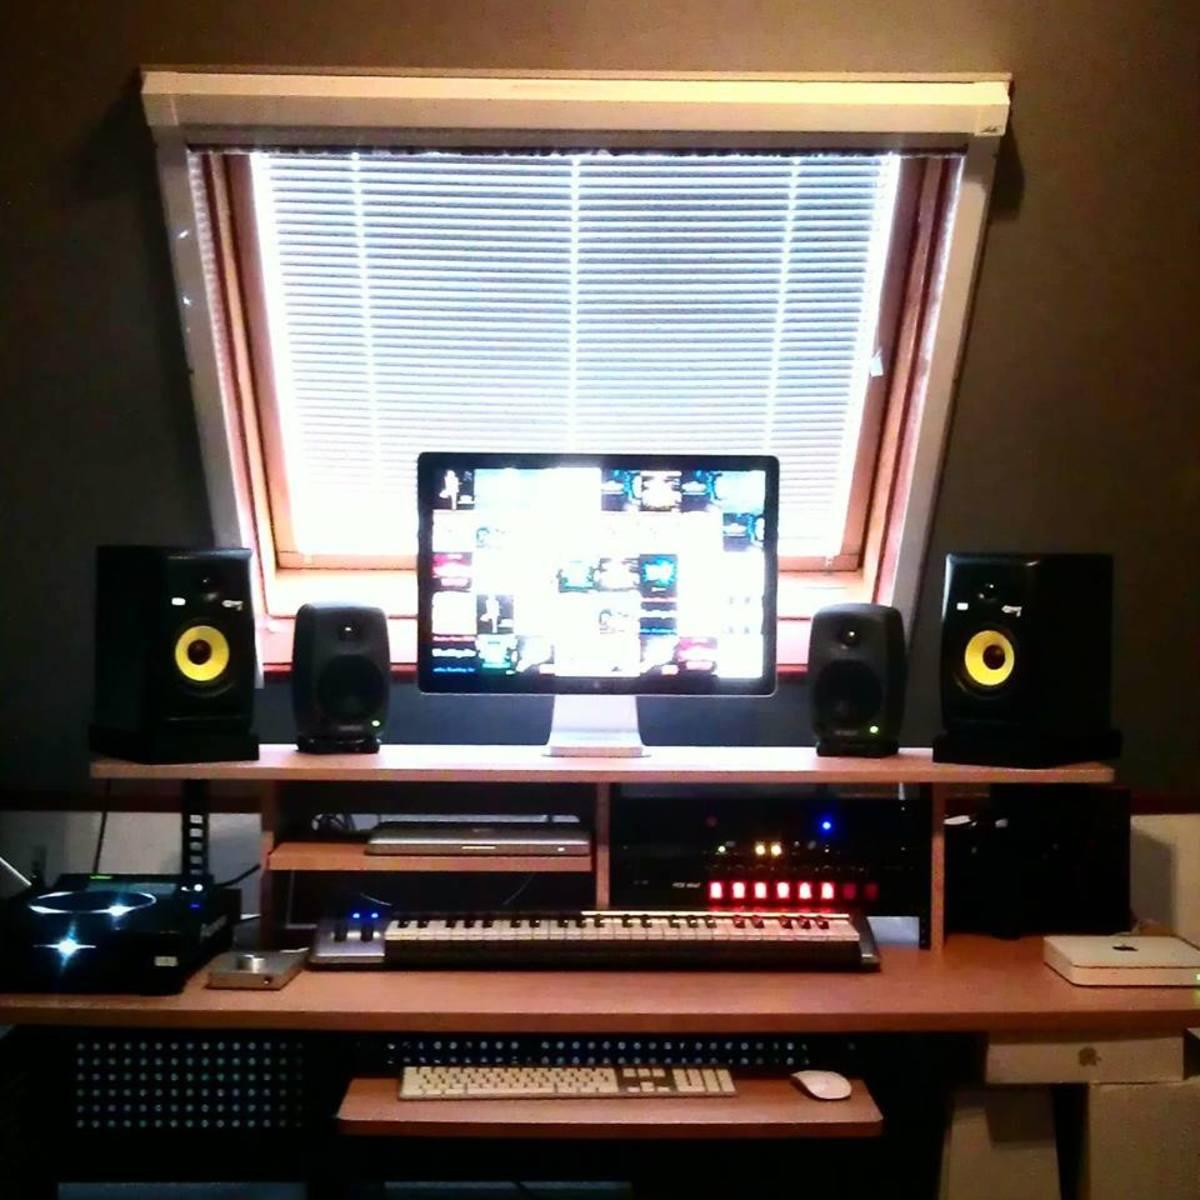 jeroenmeijer's studio photo containing M-Audio Keystation 49es MIDI Controller